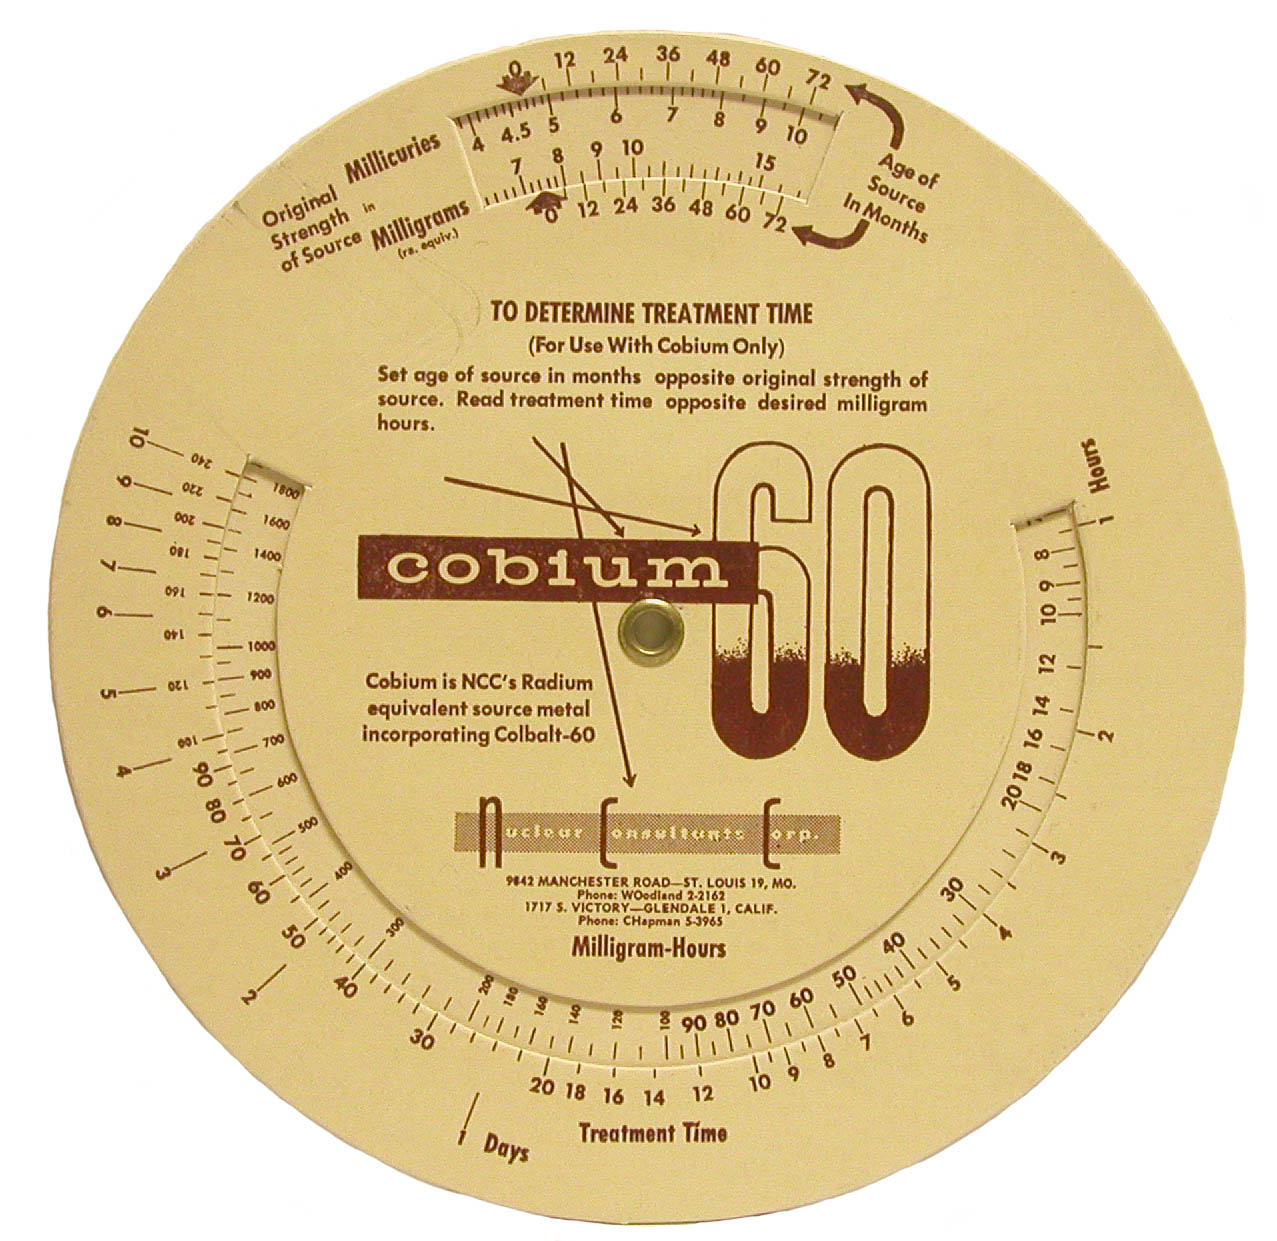 regle-circulaire-radioactivite-08